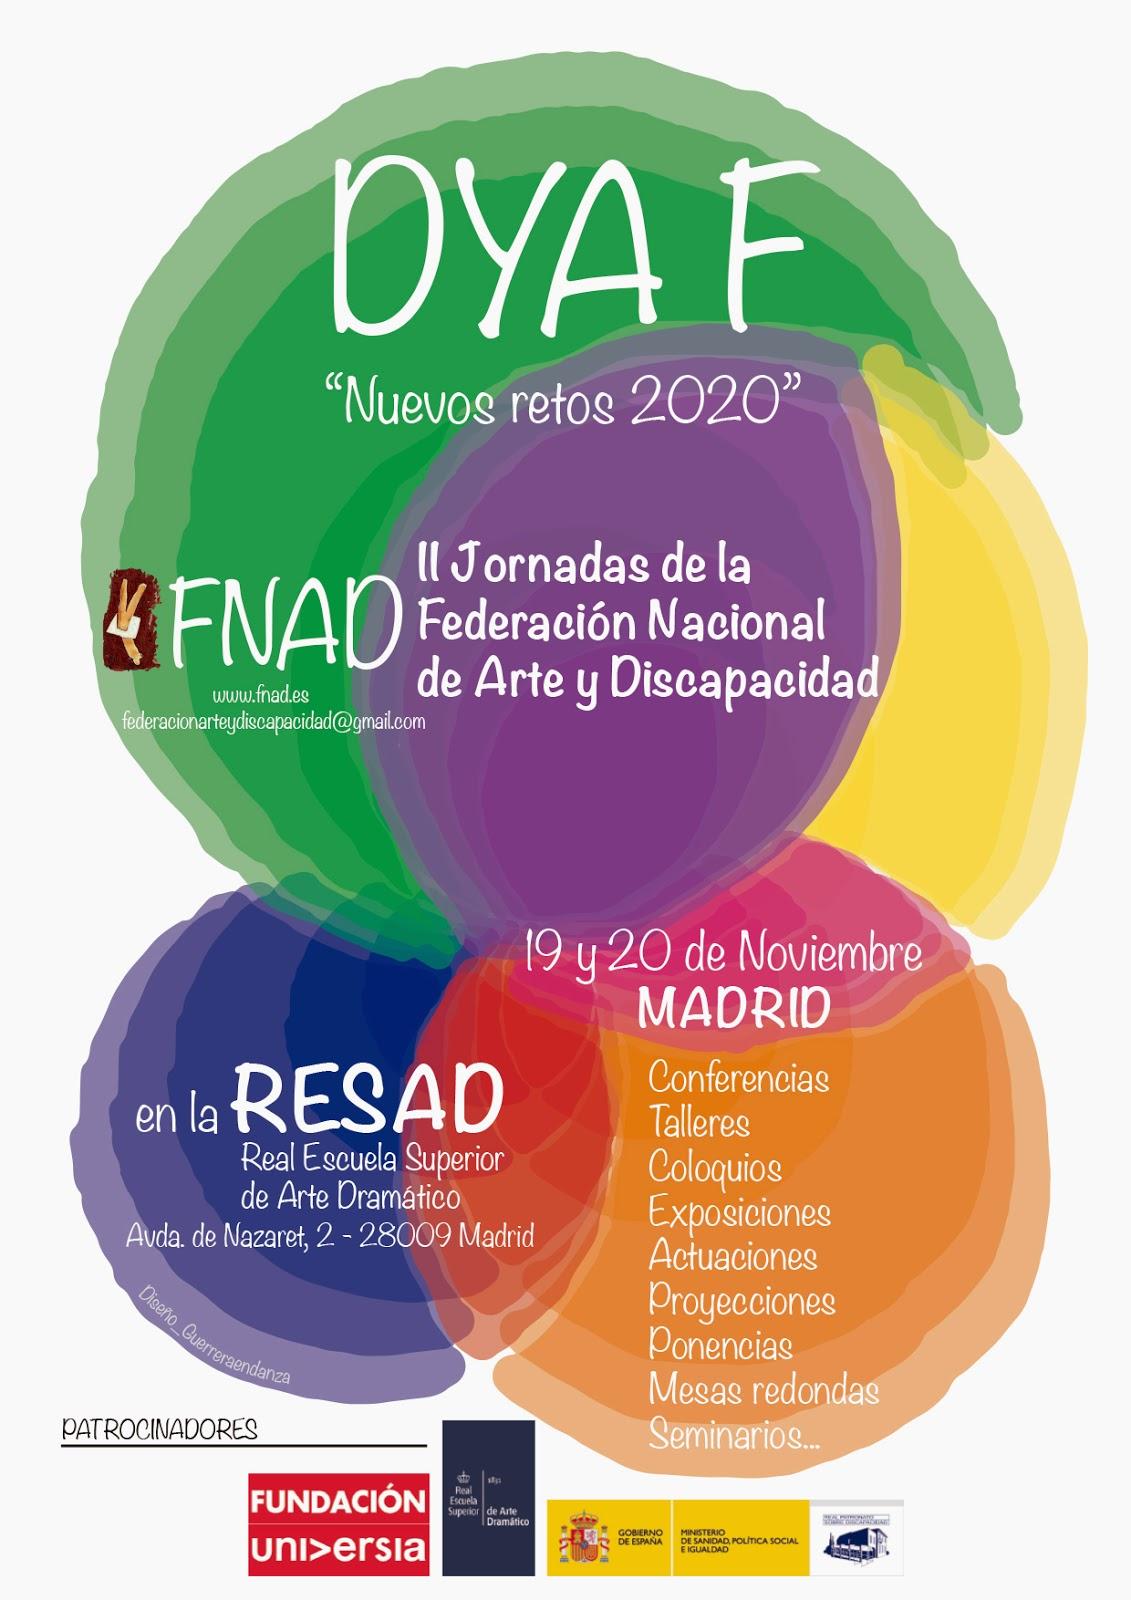 http://federacionnacionalartediscapacidad.blogspot.com.es/2014/11/dya-f-ii-jornadas-de-la-fnad-federacion.html